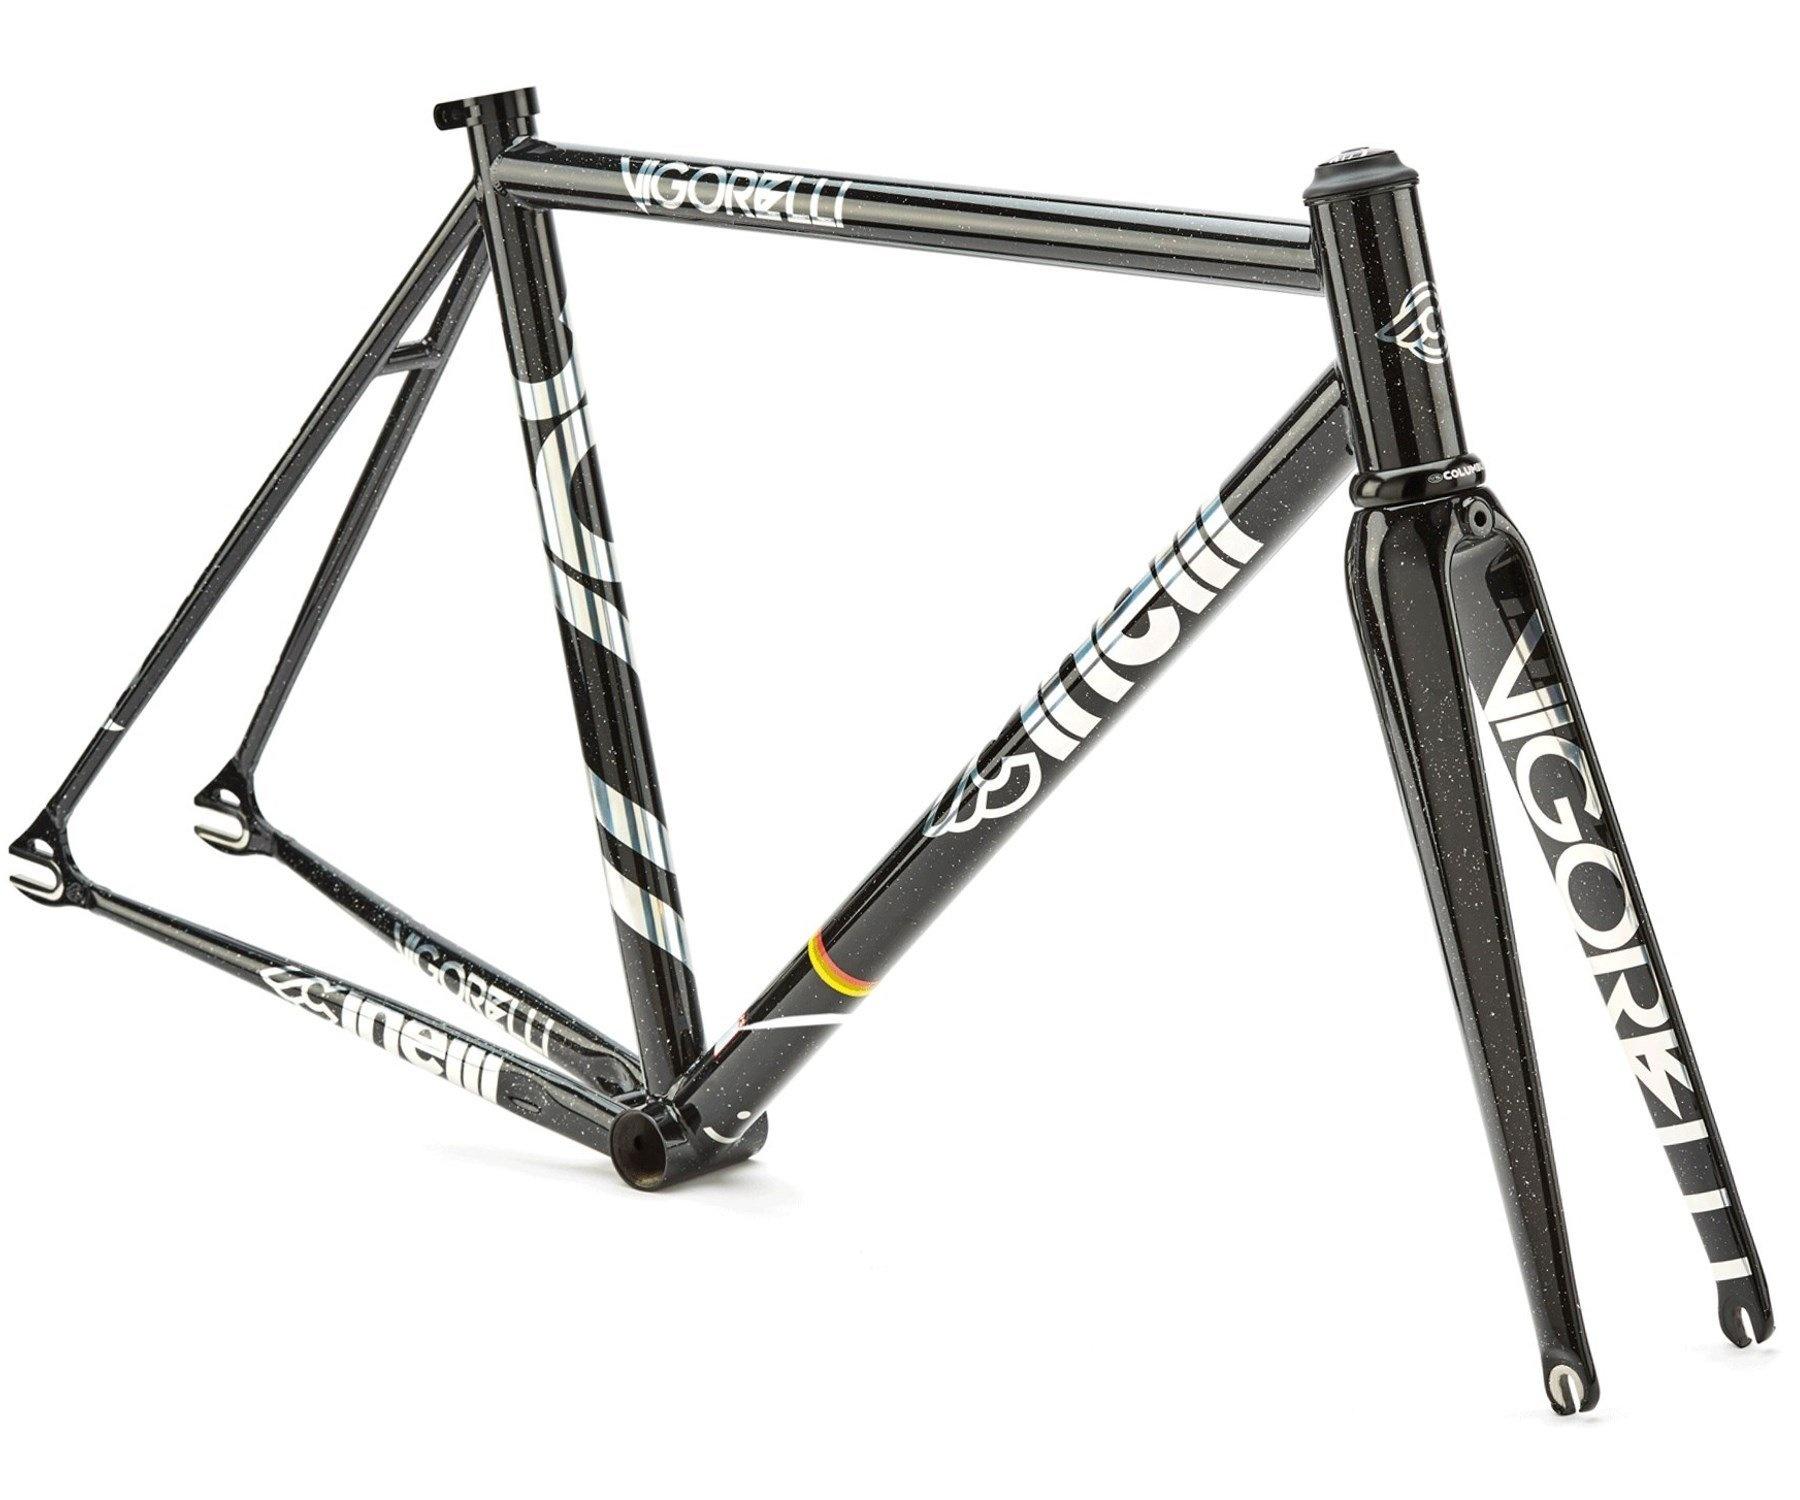 Cinelli Vigorelli Steel Track Frameset-1